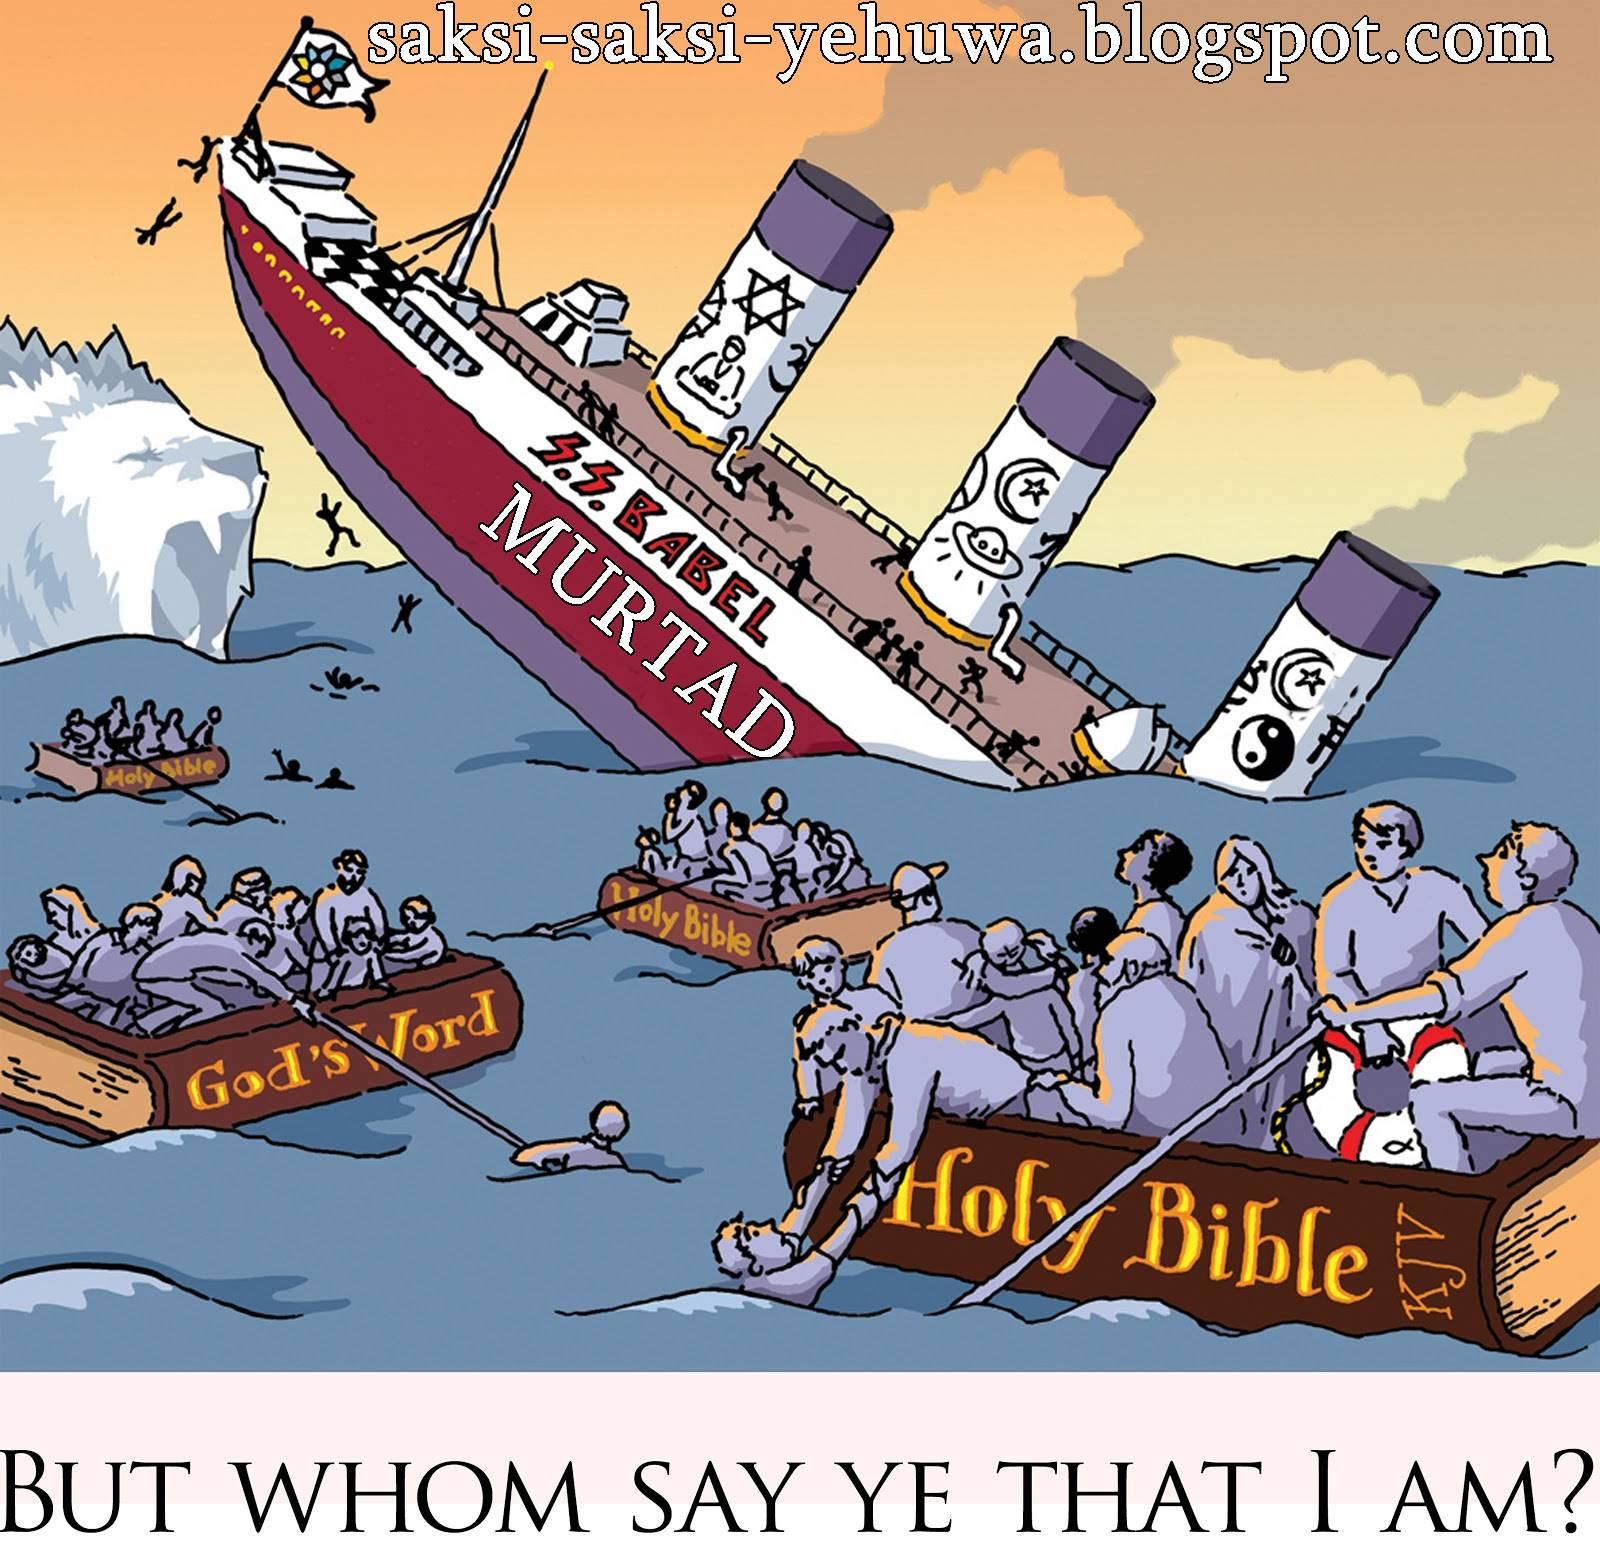 Menyingkap Fakta Ajaran Saksi Yehuwa Sesat Kultus Kristen